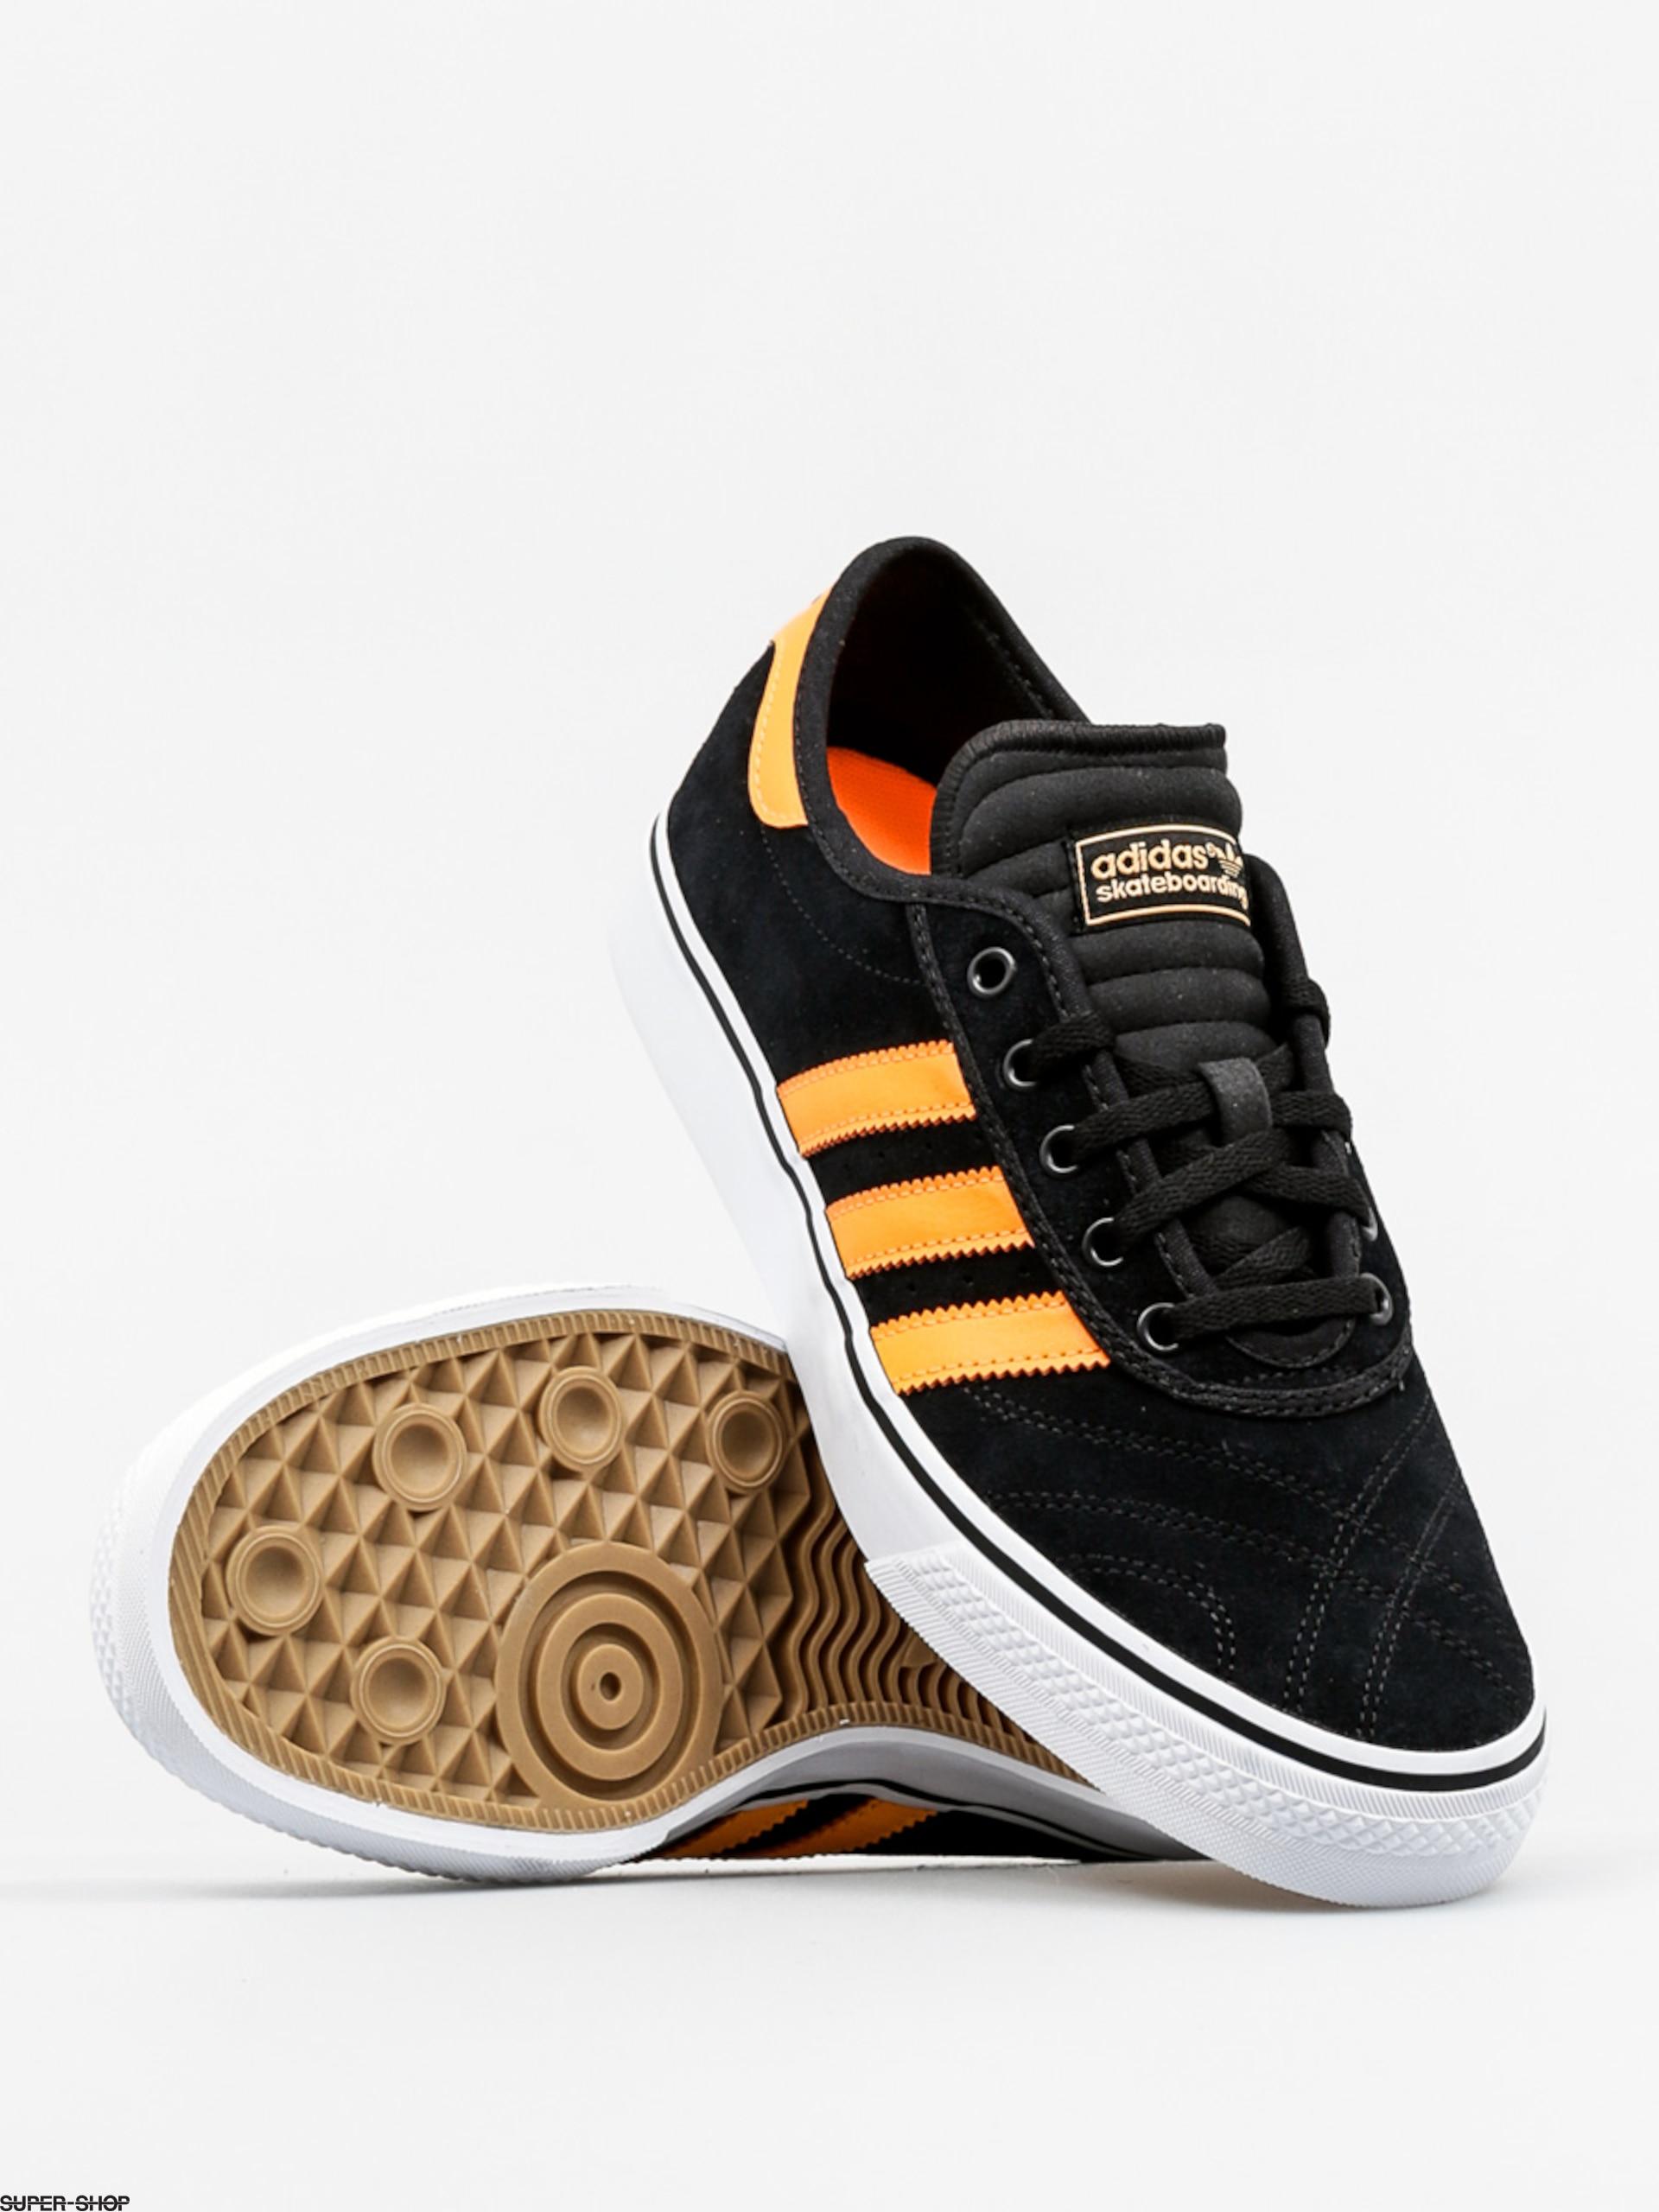 online store 11750 6803e cblacksogoldftwwht Adidas Sko Premiere Adi Ease T7wwqz1f